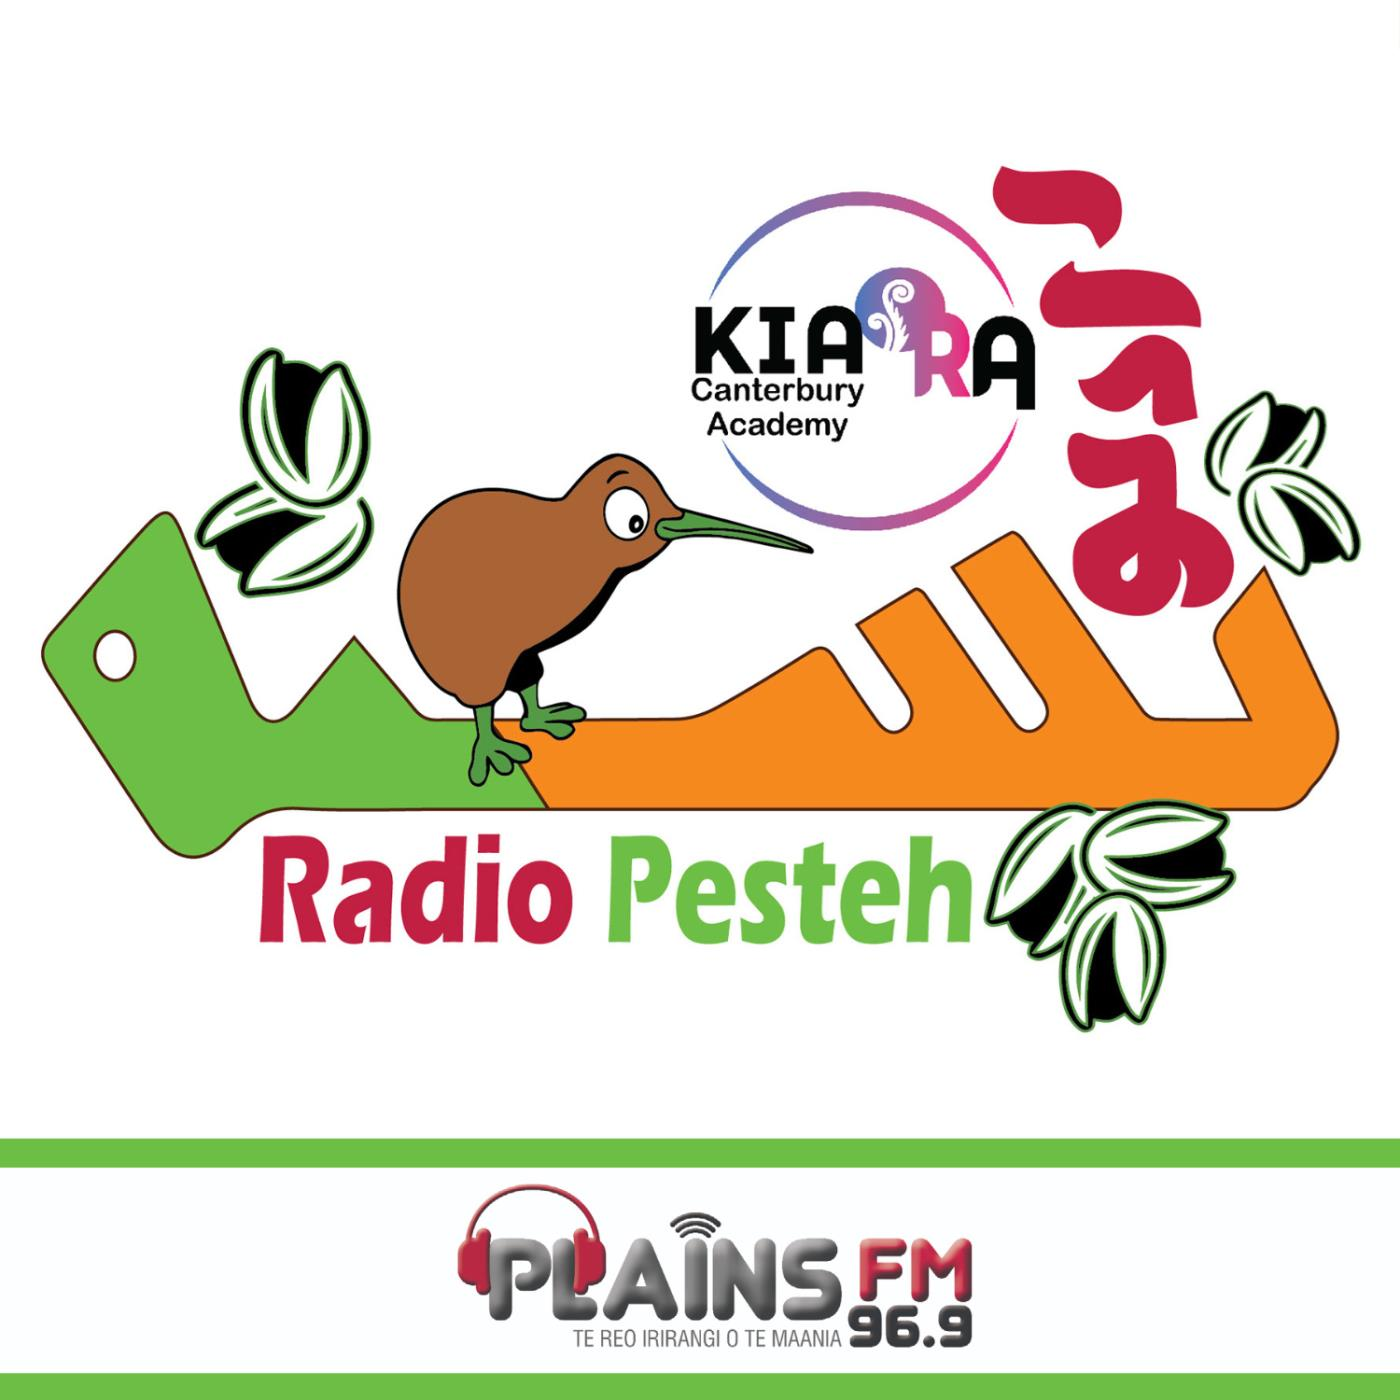 Radio Pesteh